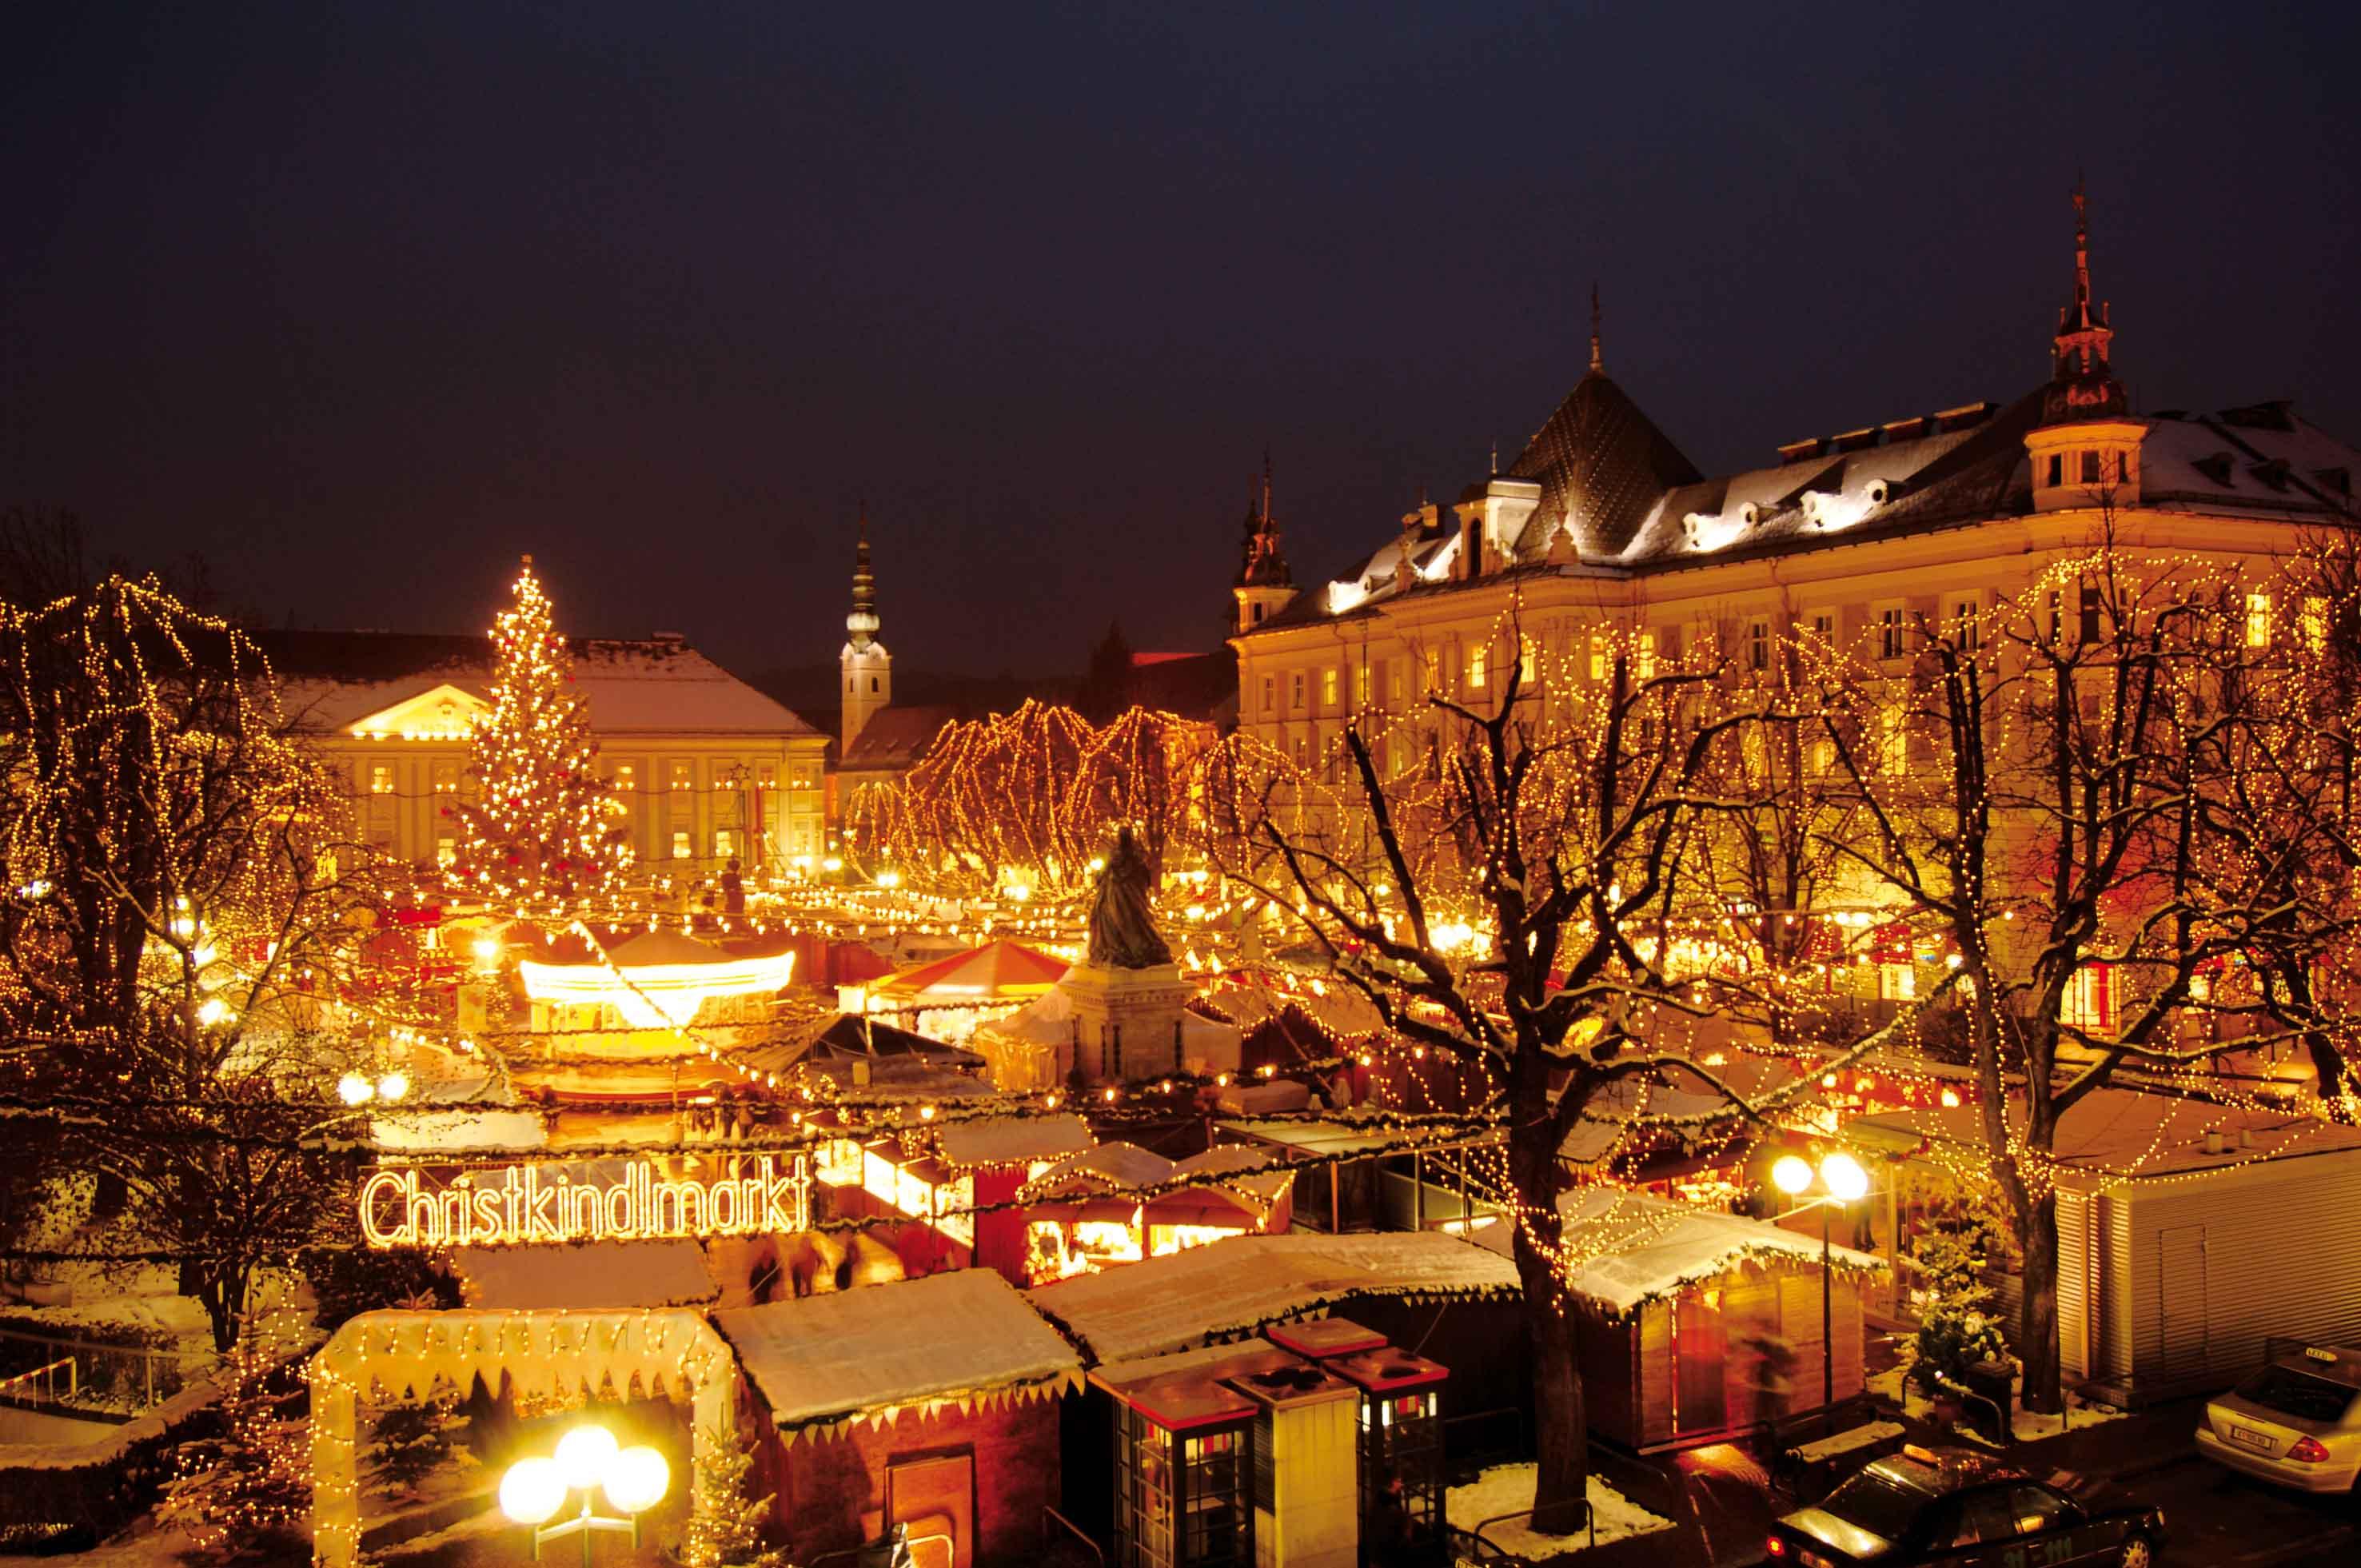 Kaernten - Winter